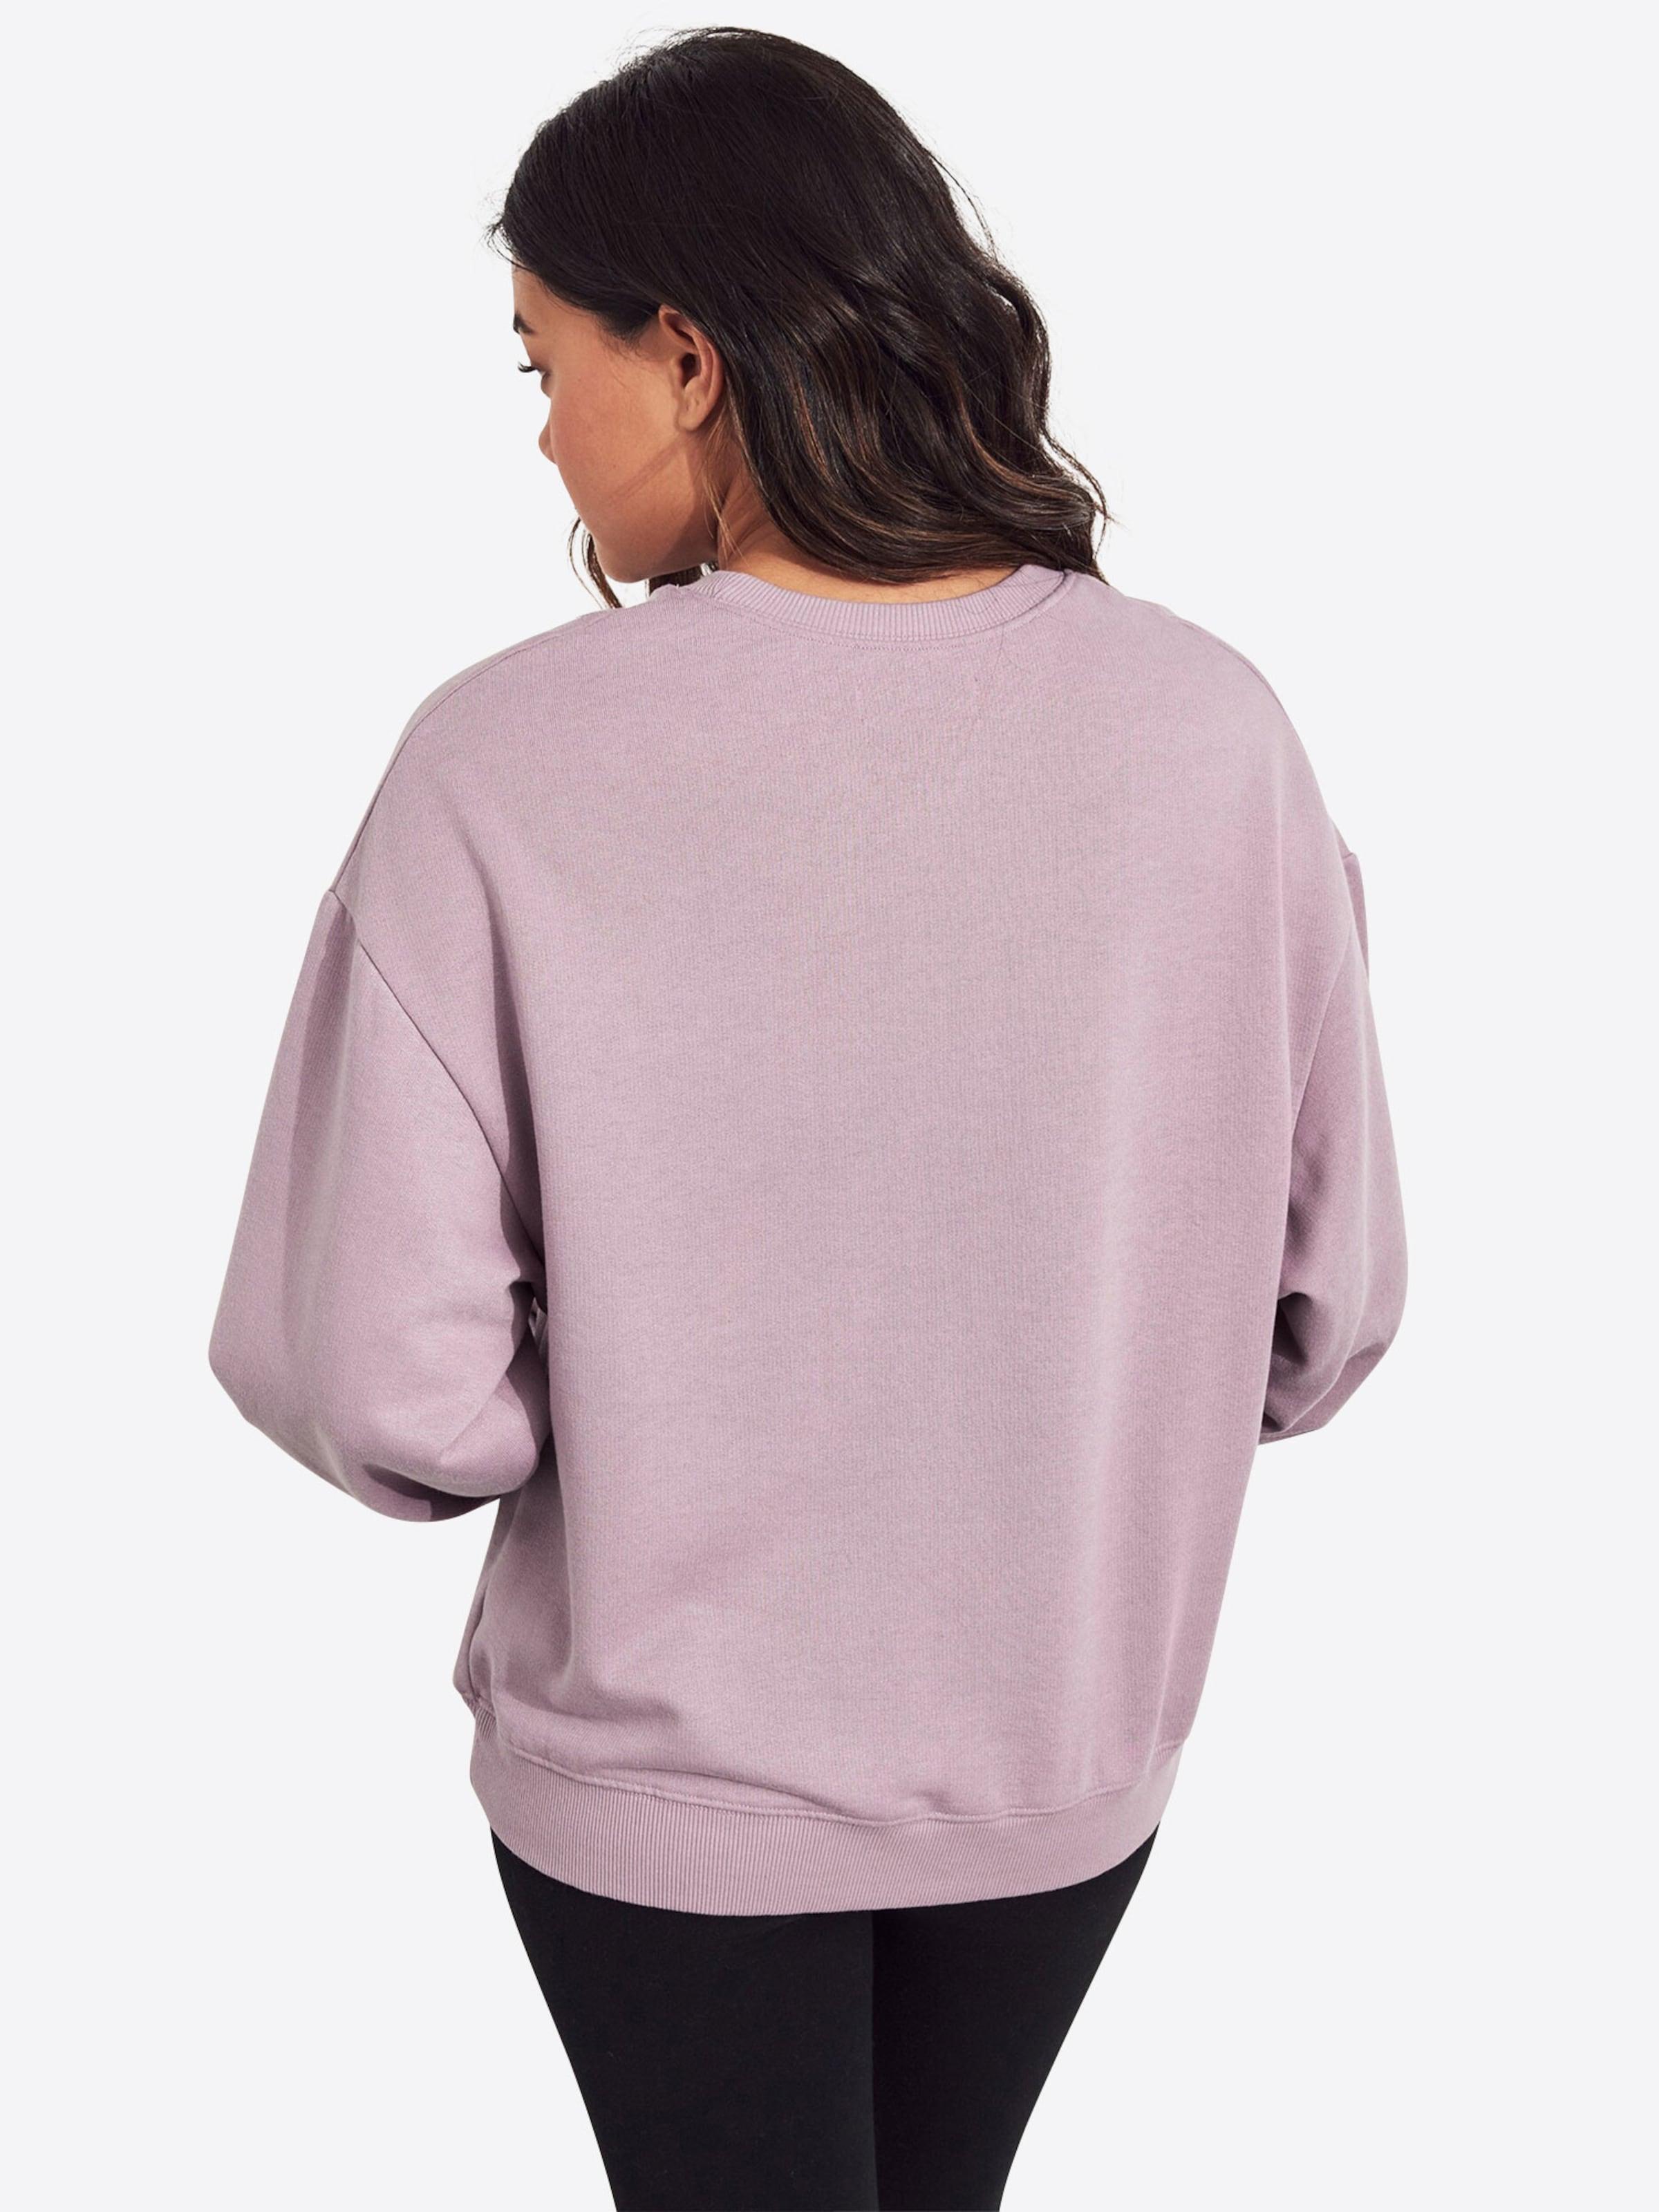 Hollister Cre' Flieder In barcelona Shoulder Sweatshirt Os Drop 's119 vf7gbIYy6